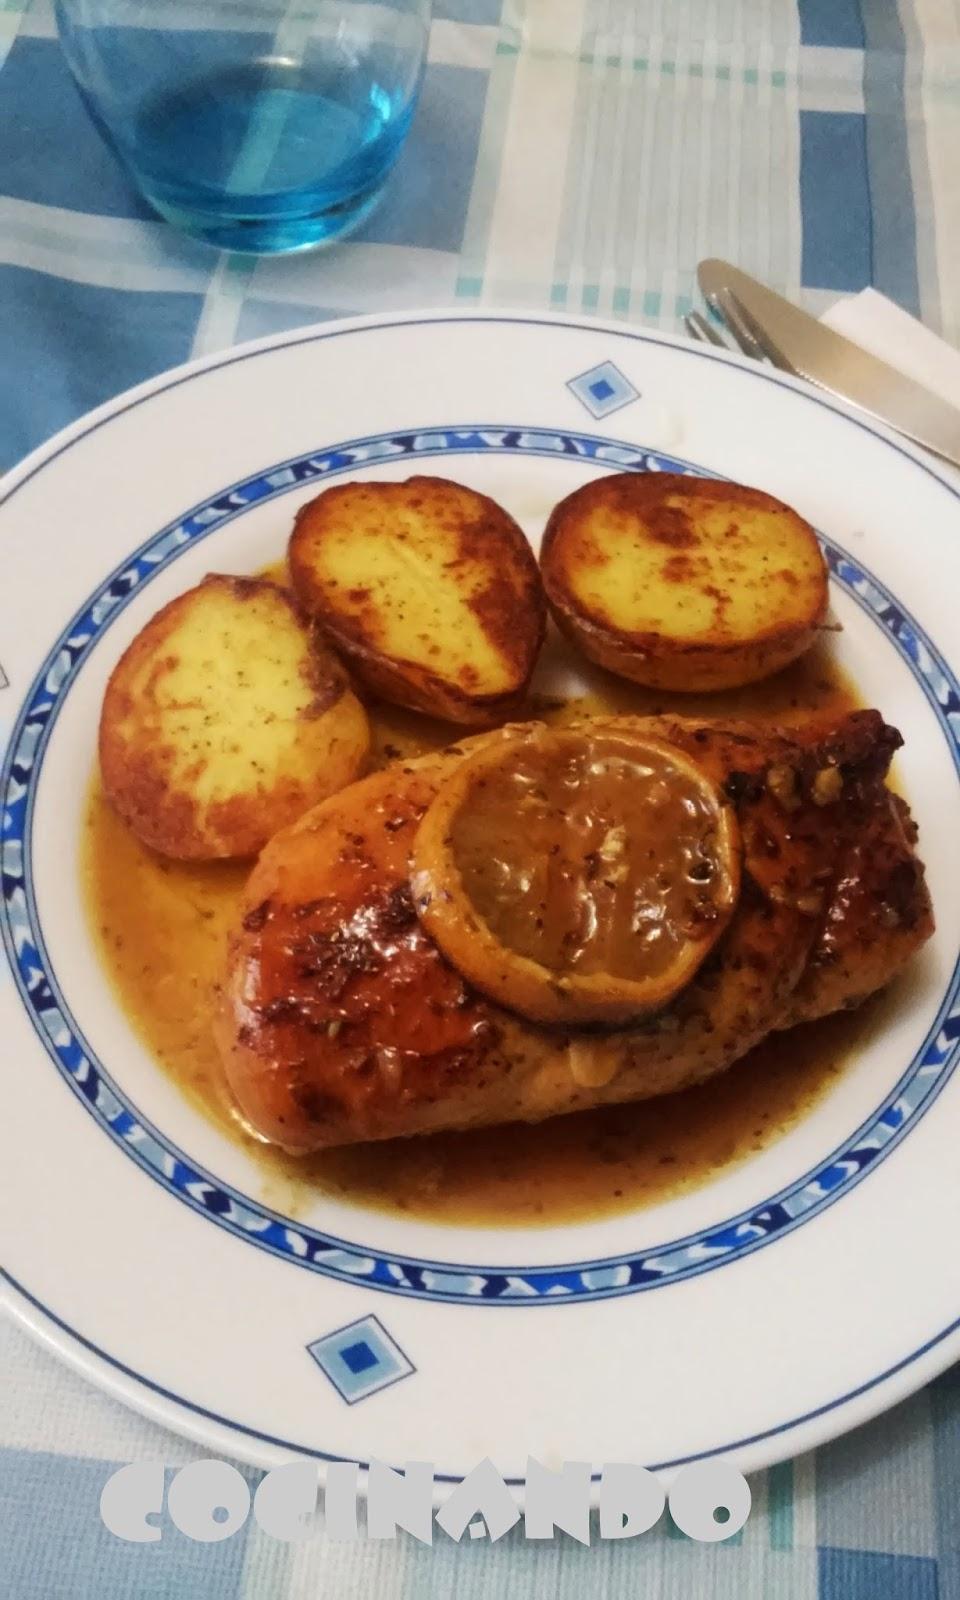 Cocinando pechugas de pollo al lim n - Pechugas al limon ...